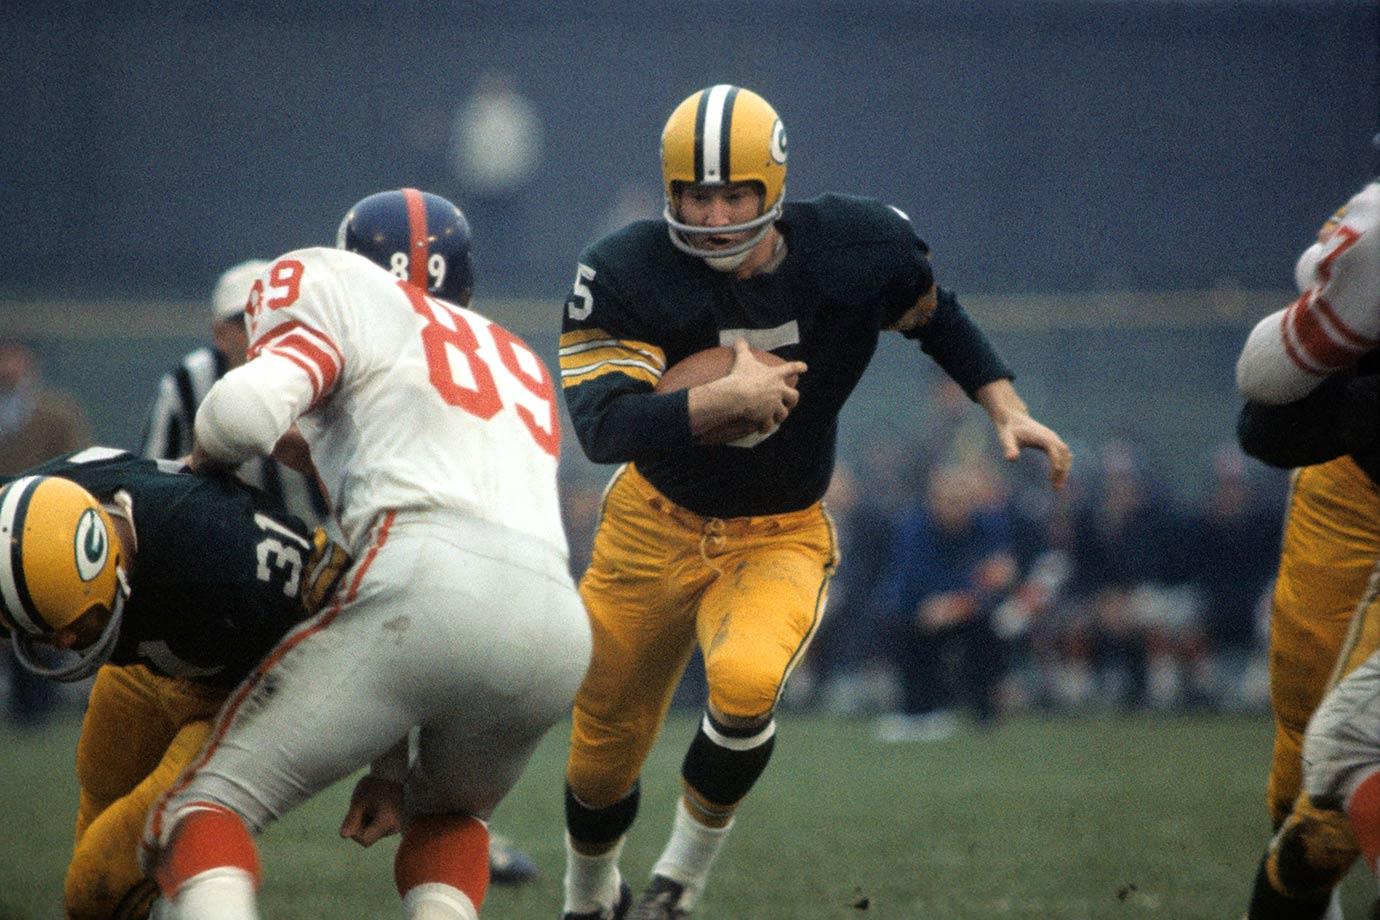 Dec. 3, 1961 — Green Bay Packers vs. New York Giants